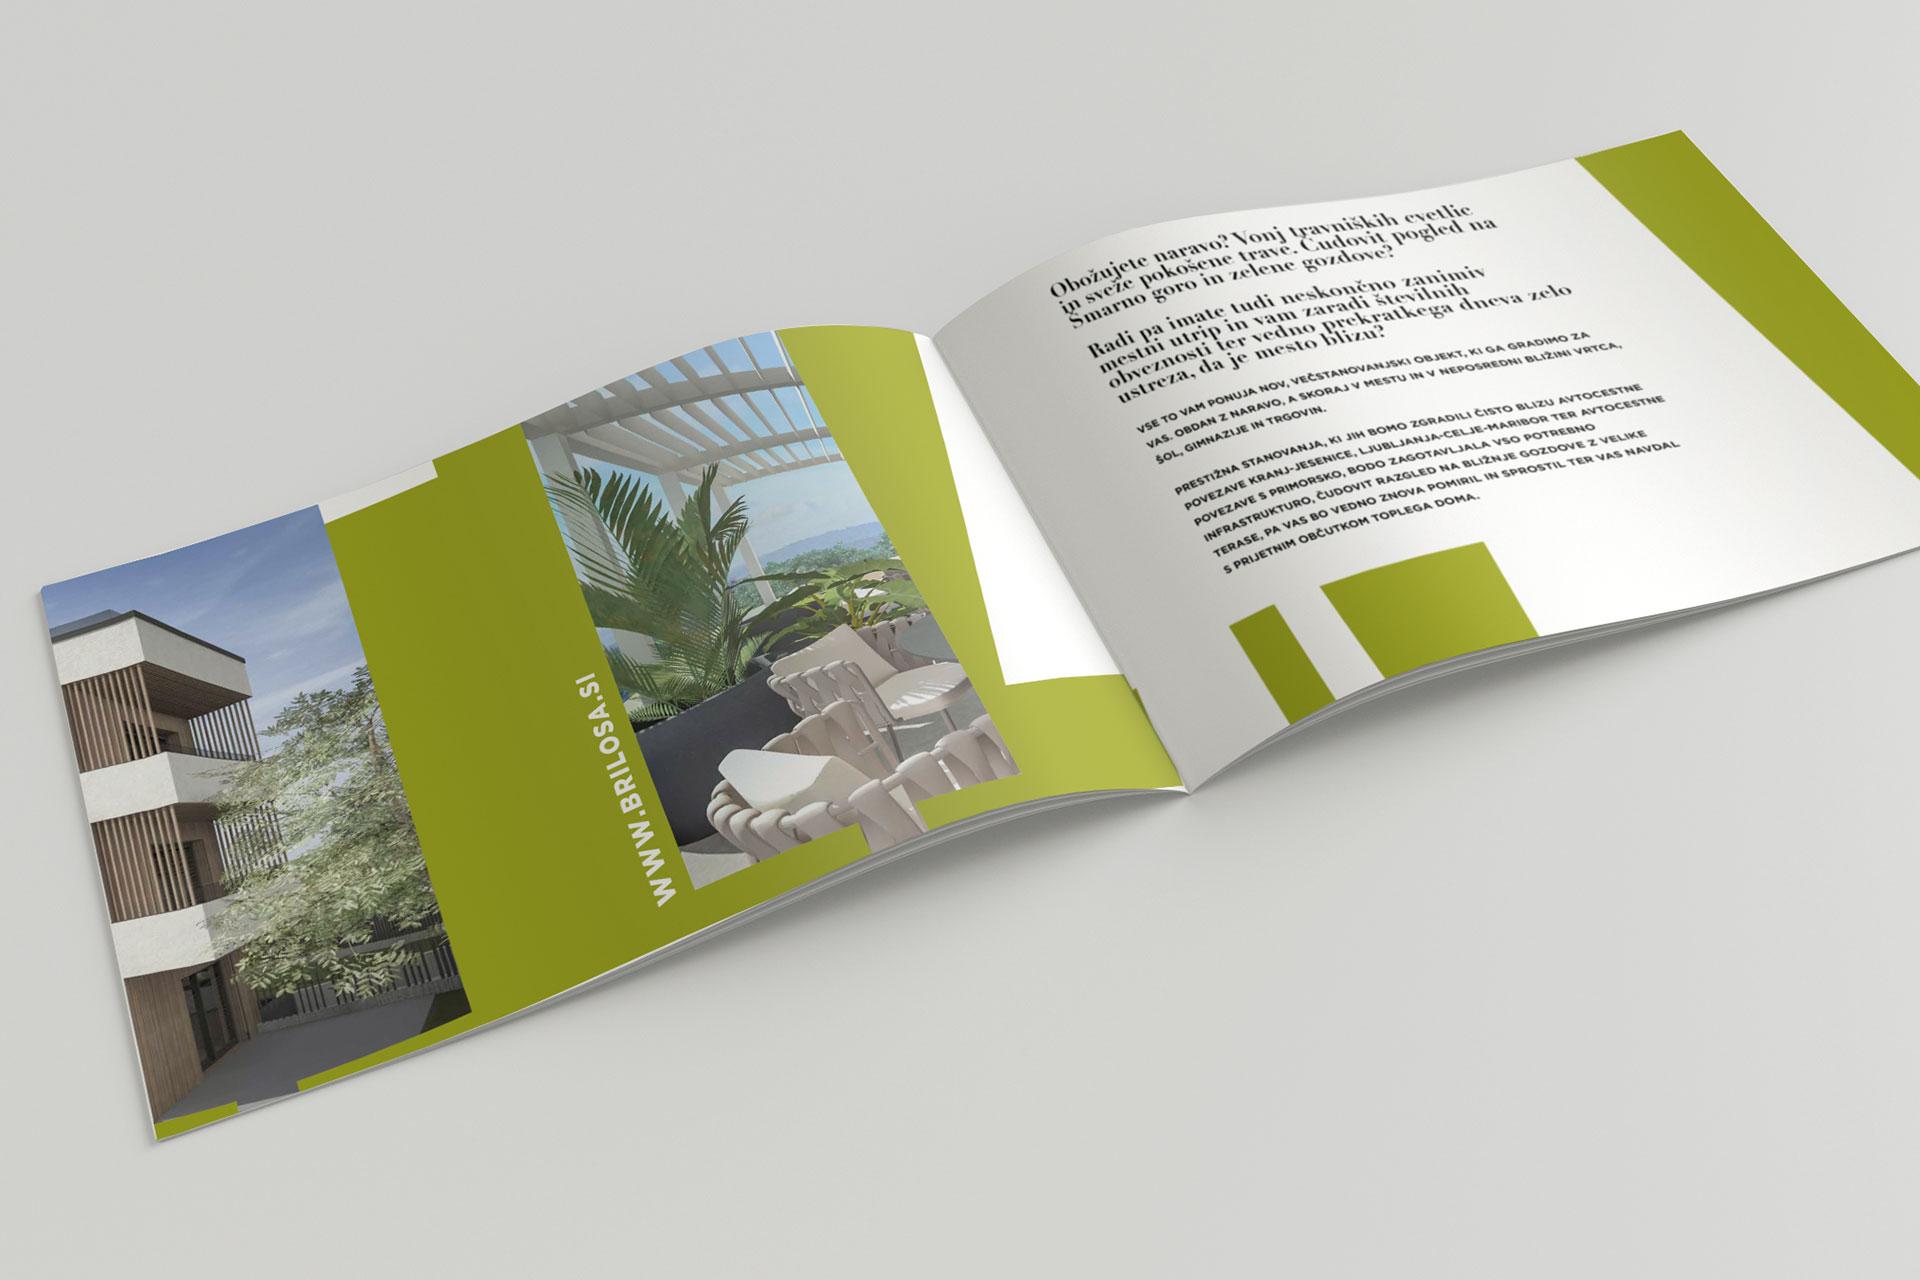 brilosa_marko-marinsek-studio-ma-ma_vizualna_katalog2